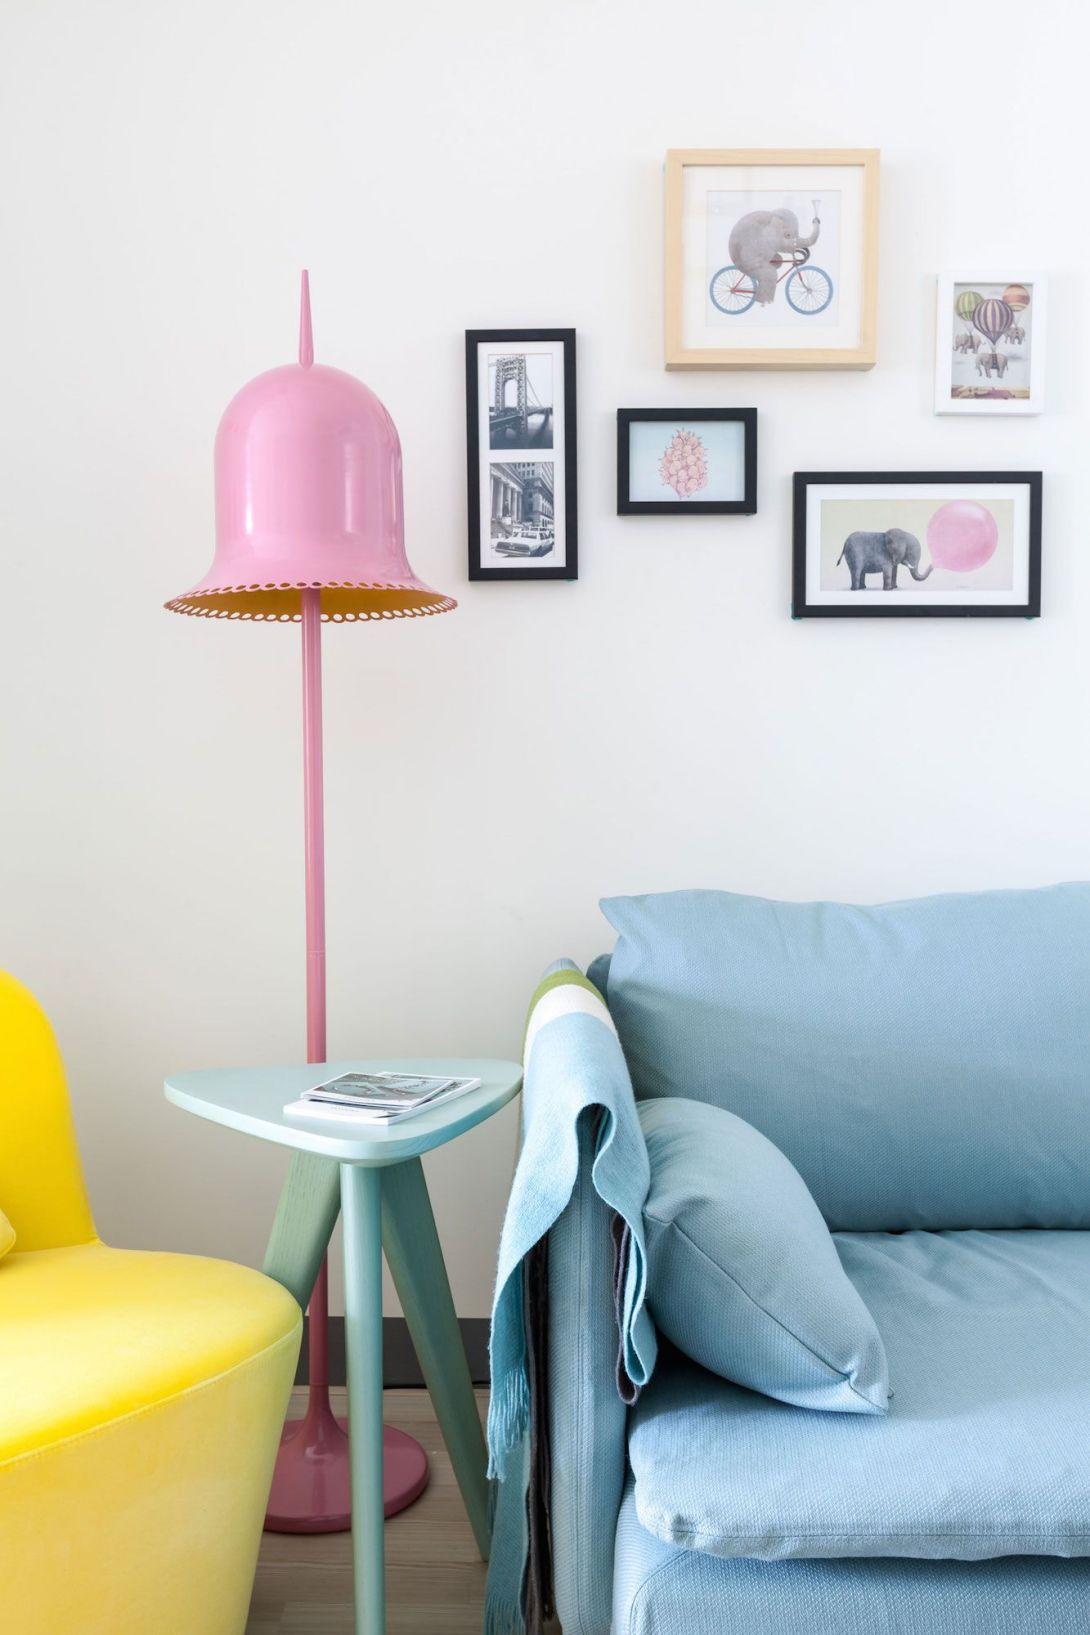 wonderland-apartment-by-house-design-studio-8